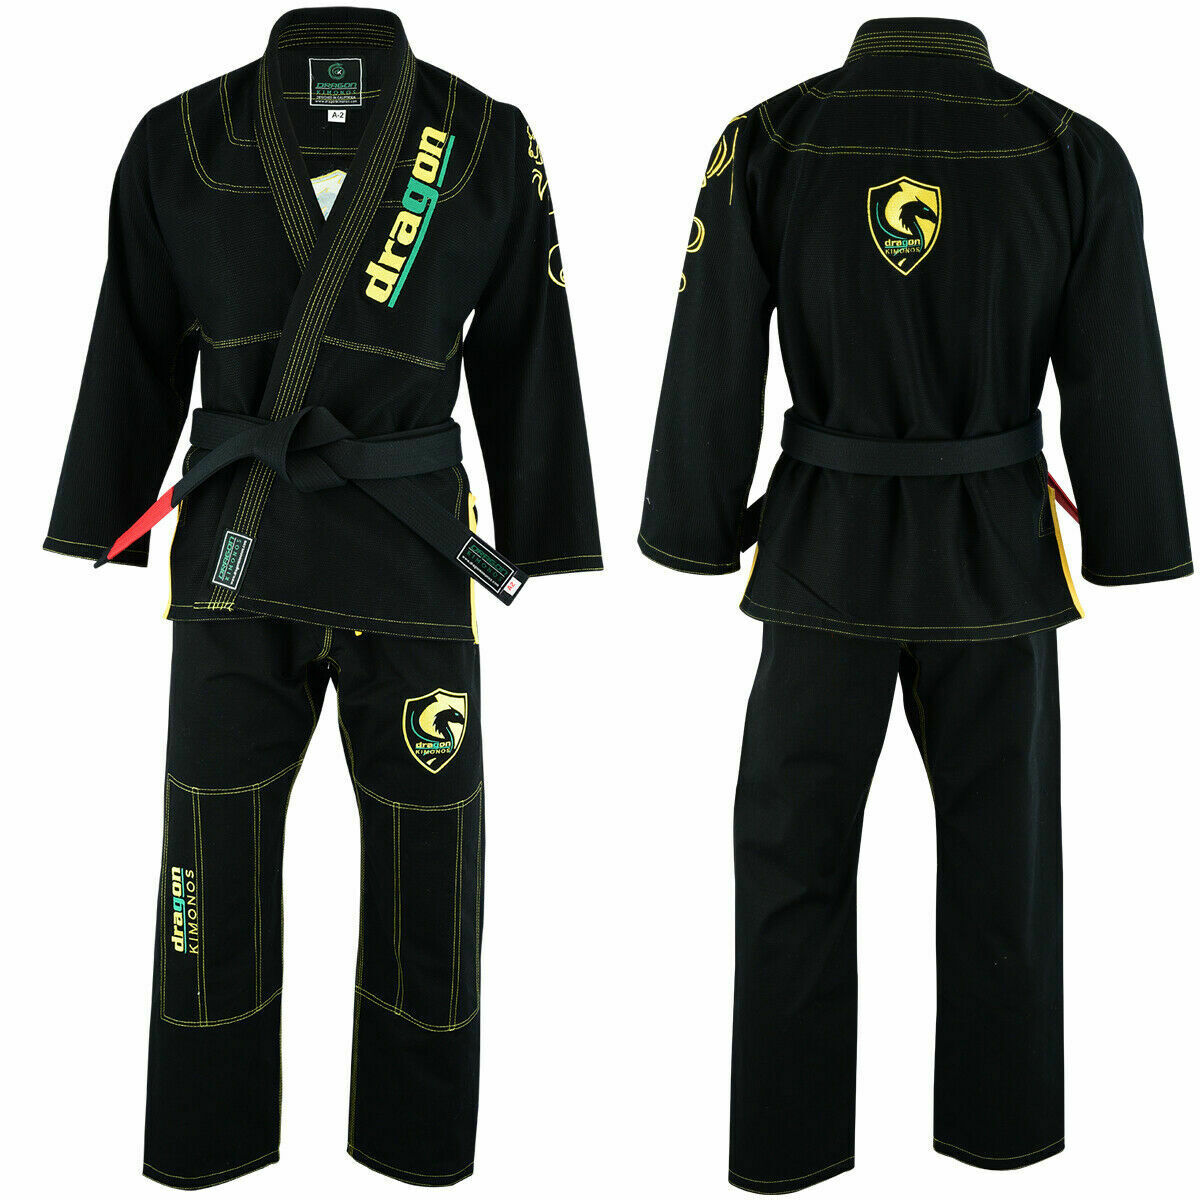 BJJ Gi For Men Women Brazilian Jiu Jitsu Gi Uniform Kimono A